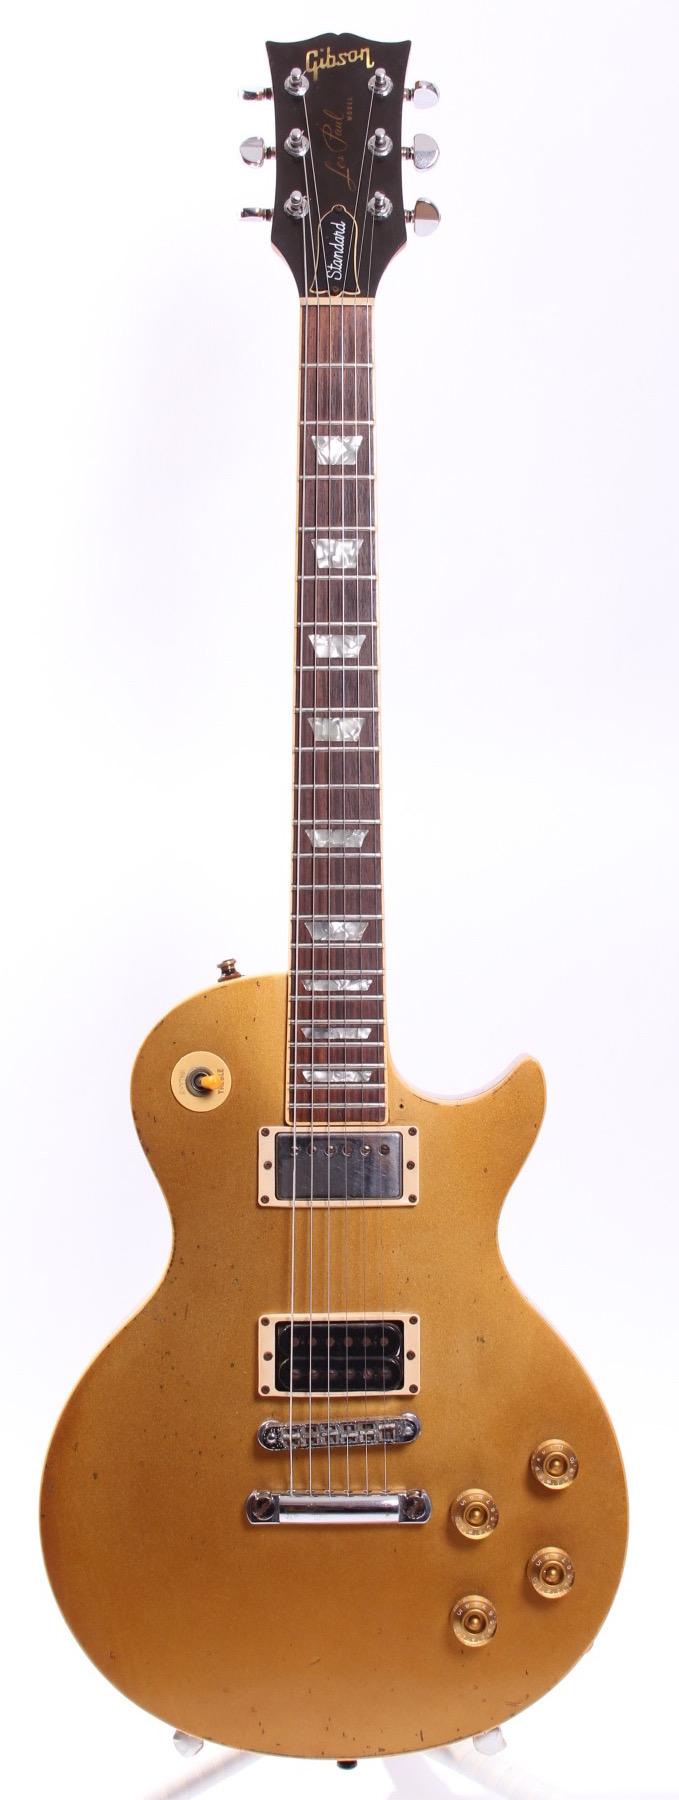 gibson les paul standard 1978 goldtop guitar for sale yeahman 39 s guitars. Black Bedroom Furniture Sets. Home Design Ideas